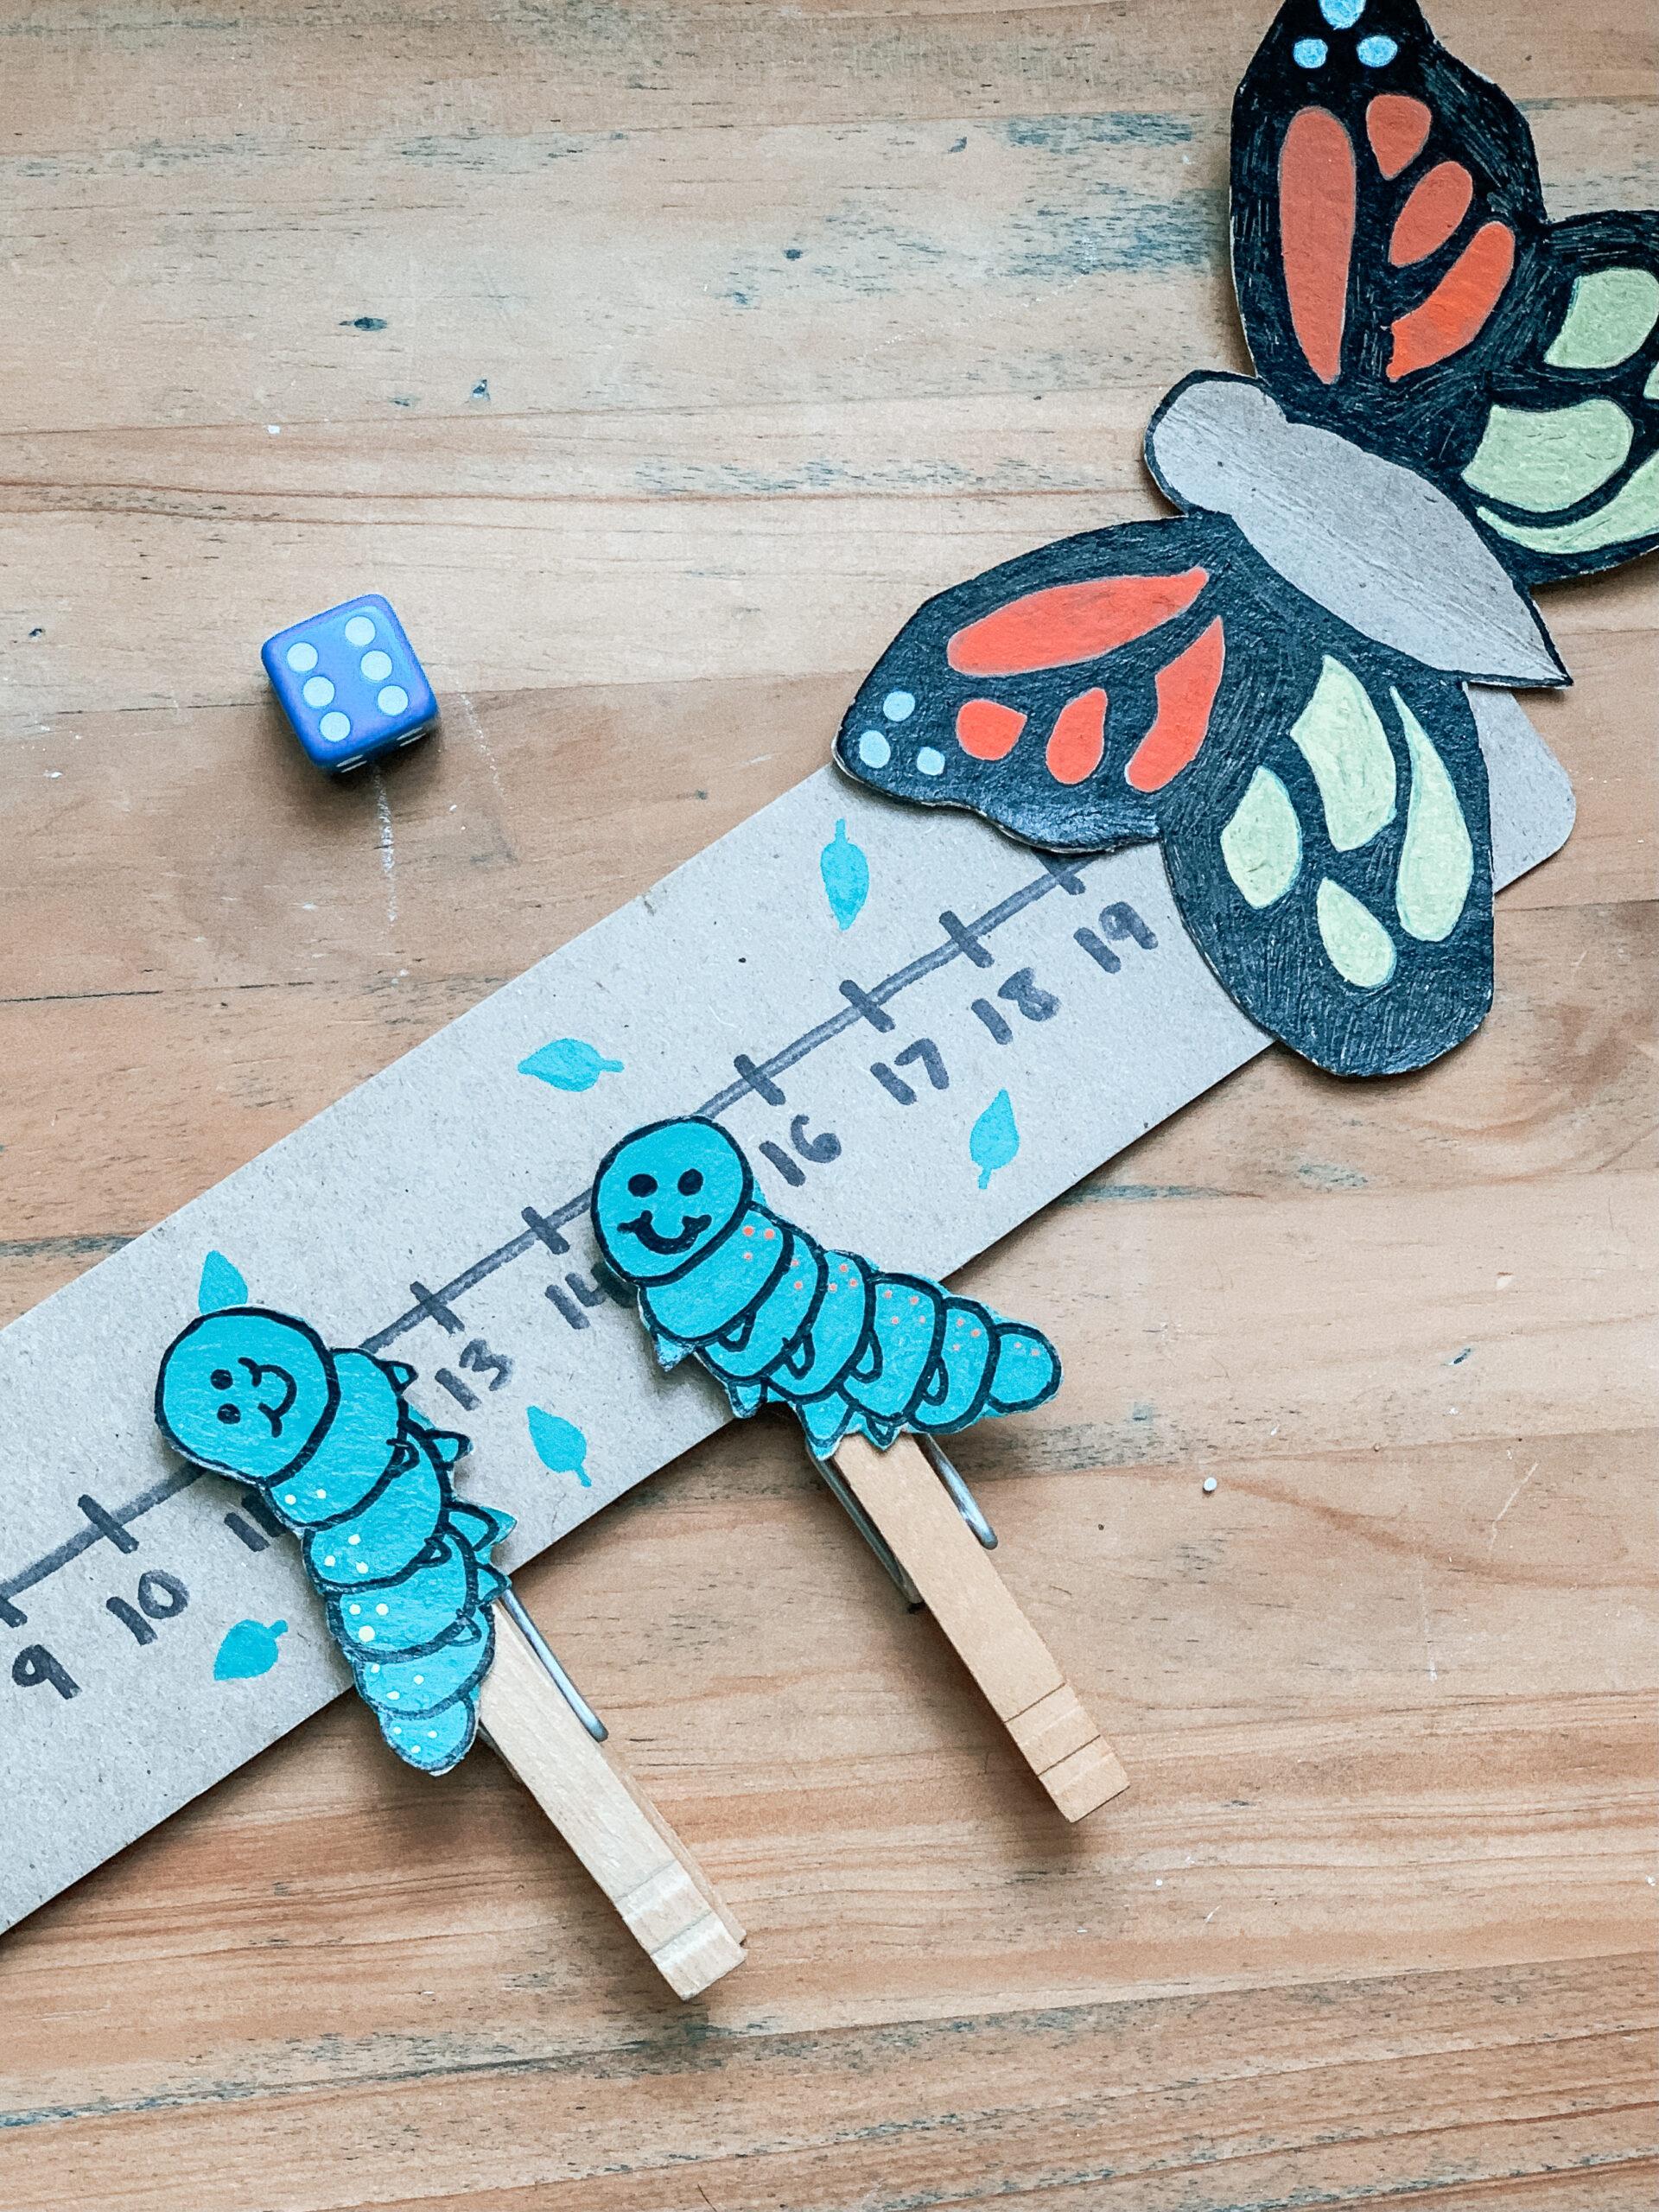 DIY preschool game